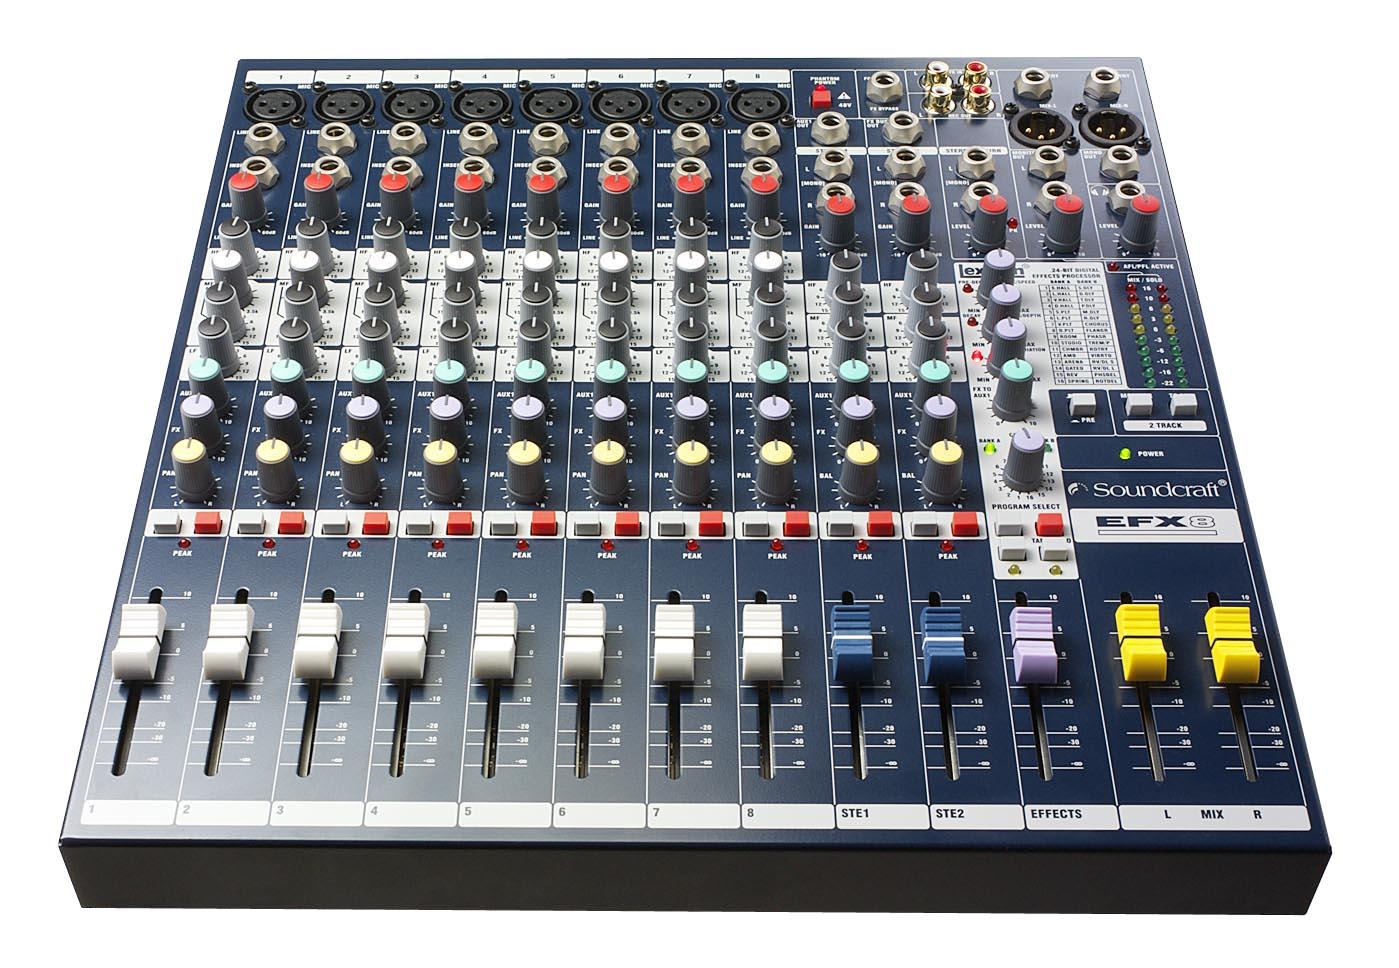 EFX8 | Soundcraft - Professional Audio Mixers